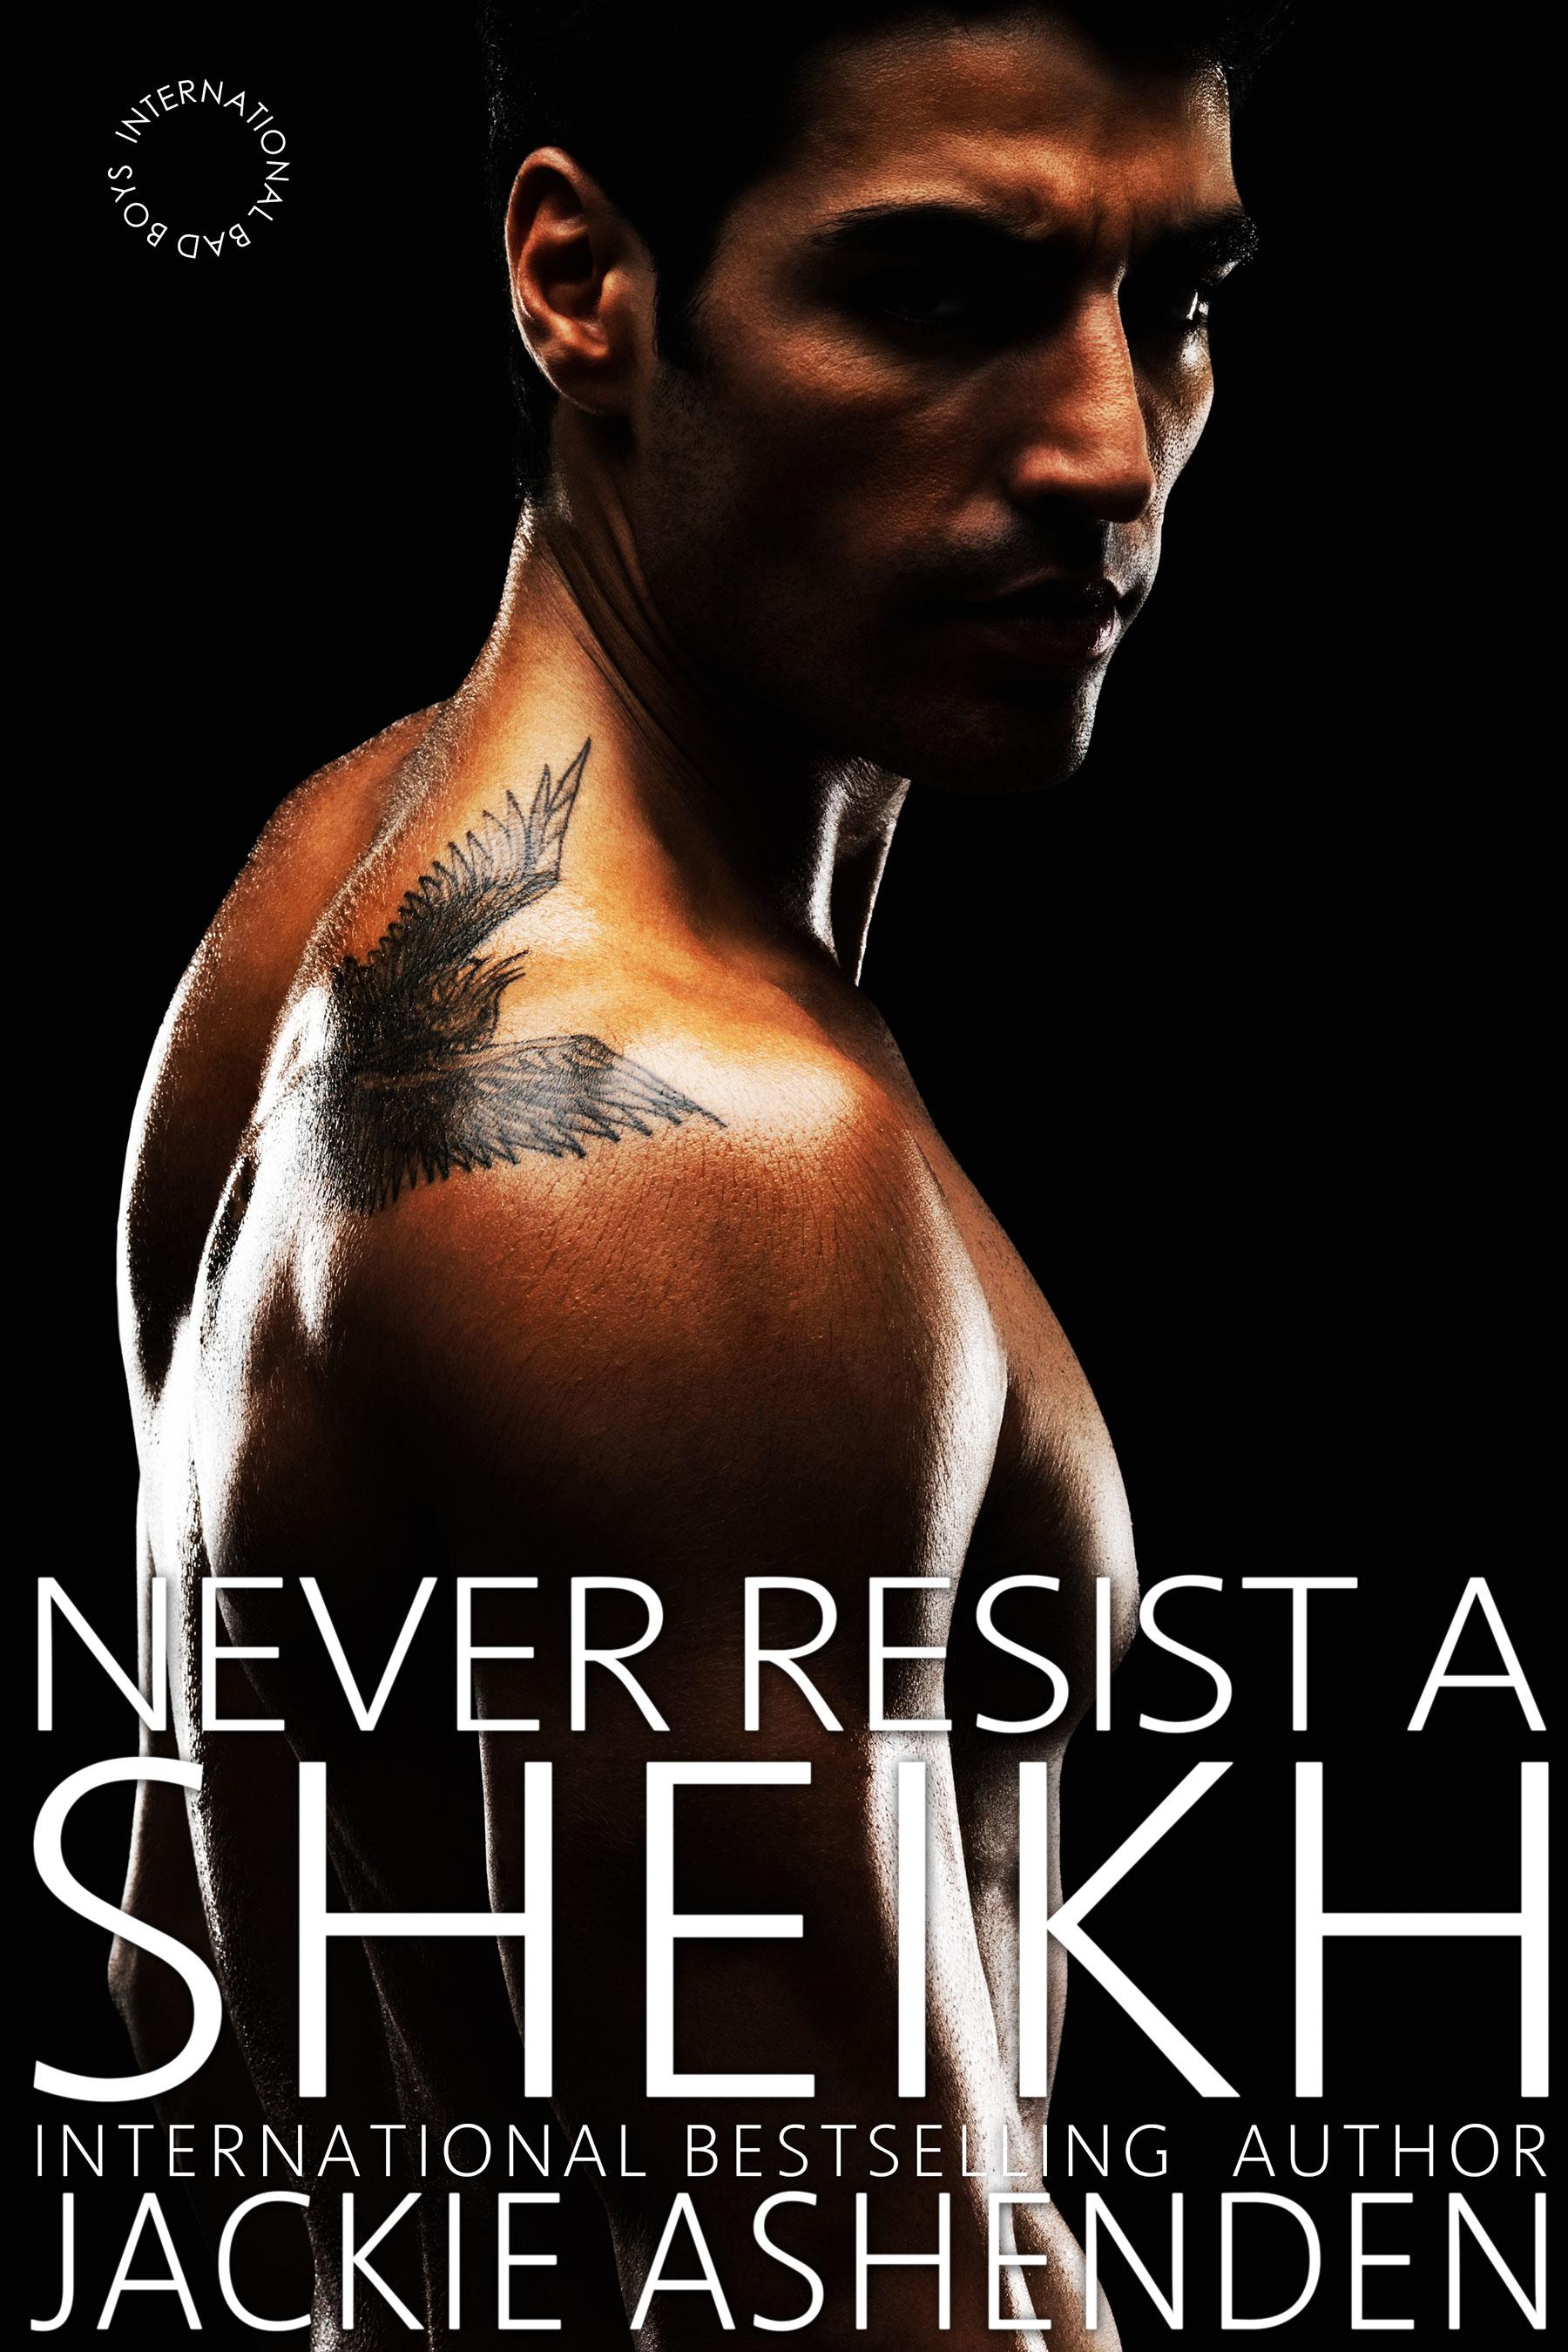 Never Resist A Shiekh